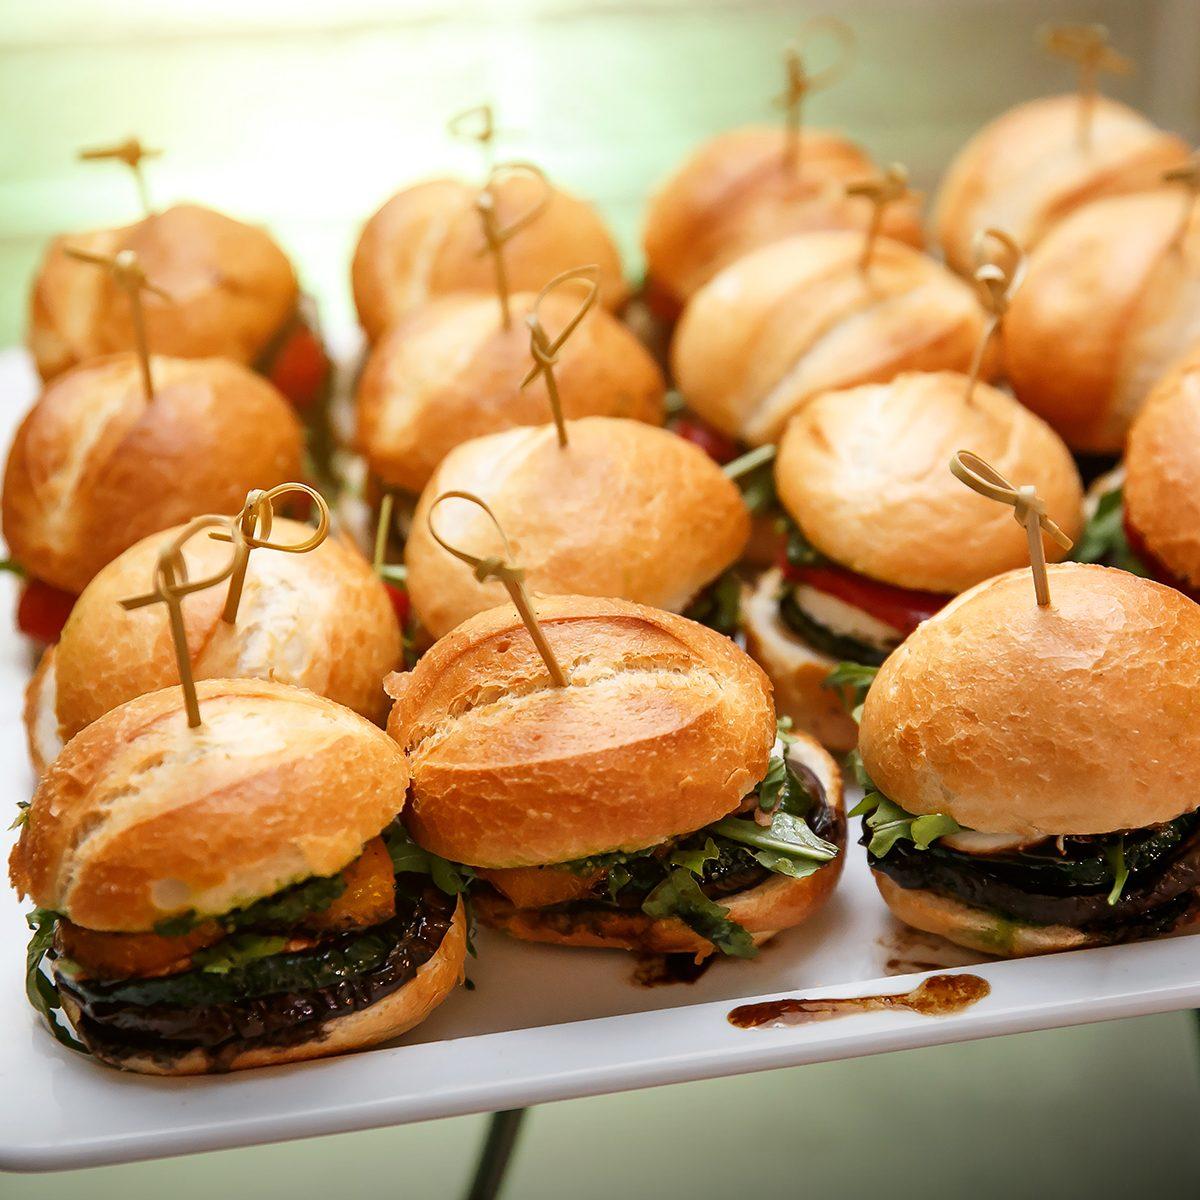 mini burger canape selection on slate platter